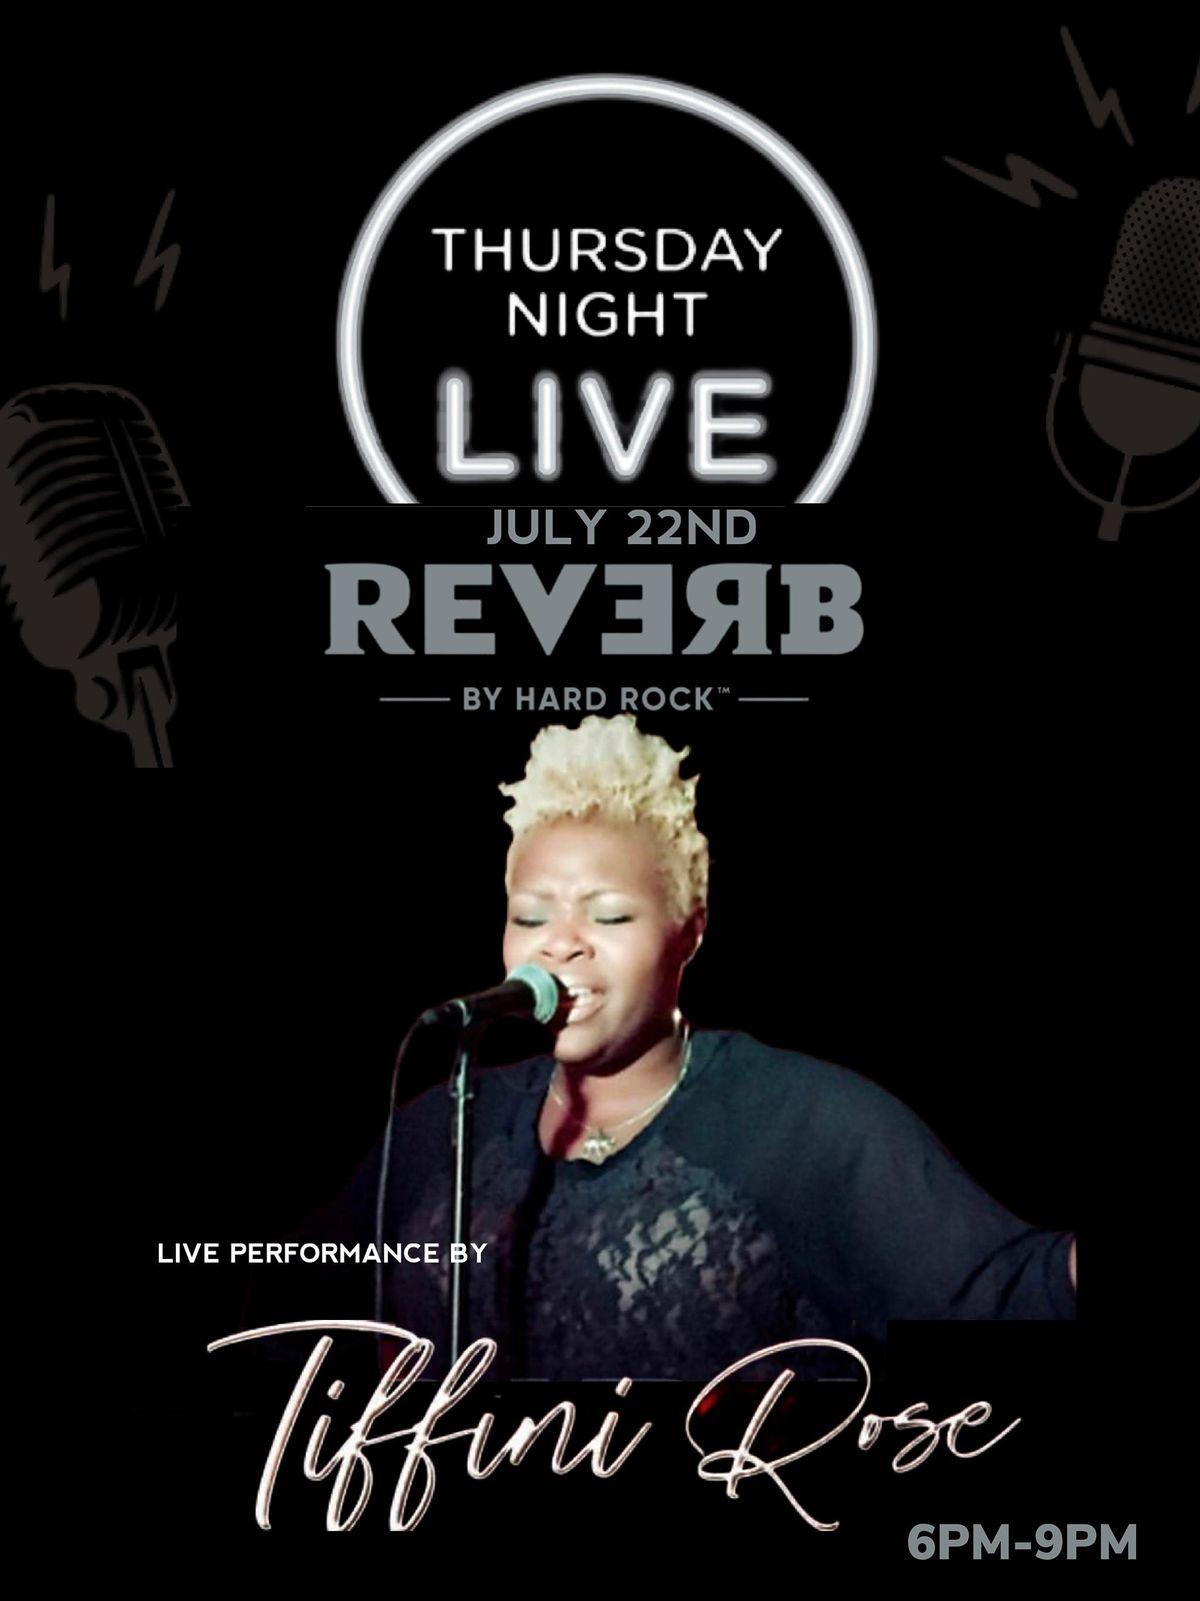 THURSDAY NIGHT LIVE @ REVERB